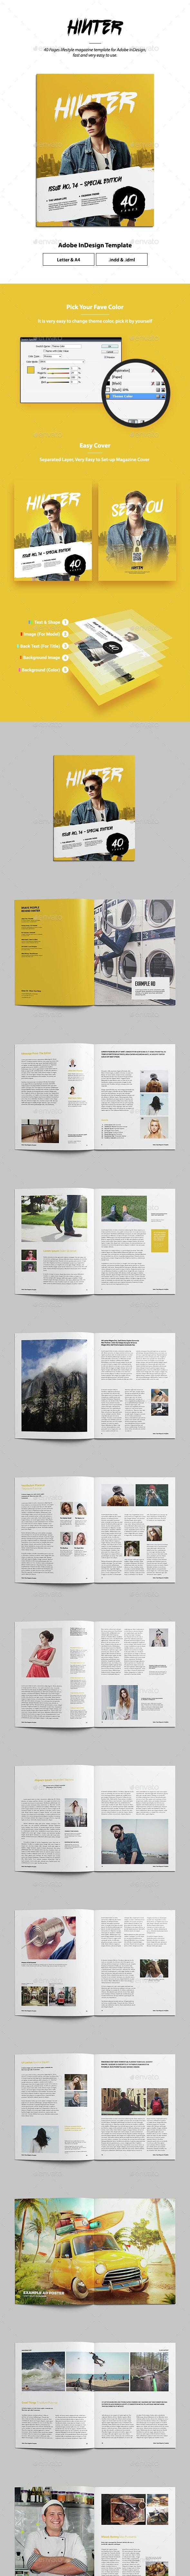 Hinter Lifestyle Magazine Template - Magazines Print Templates